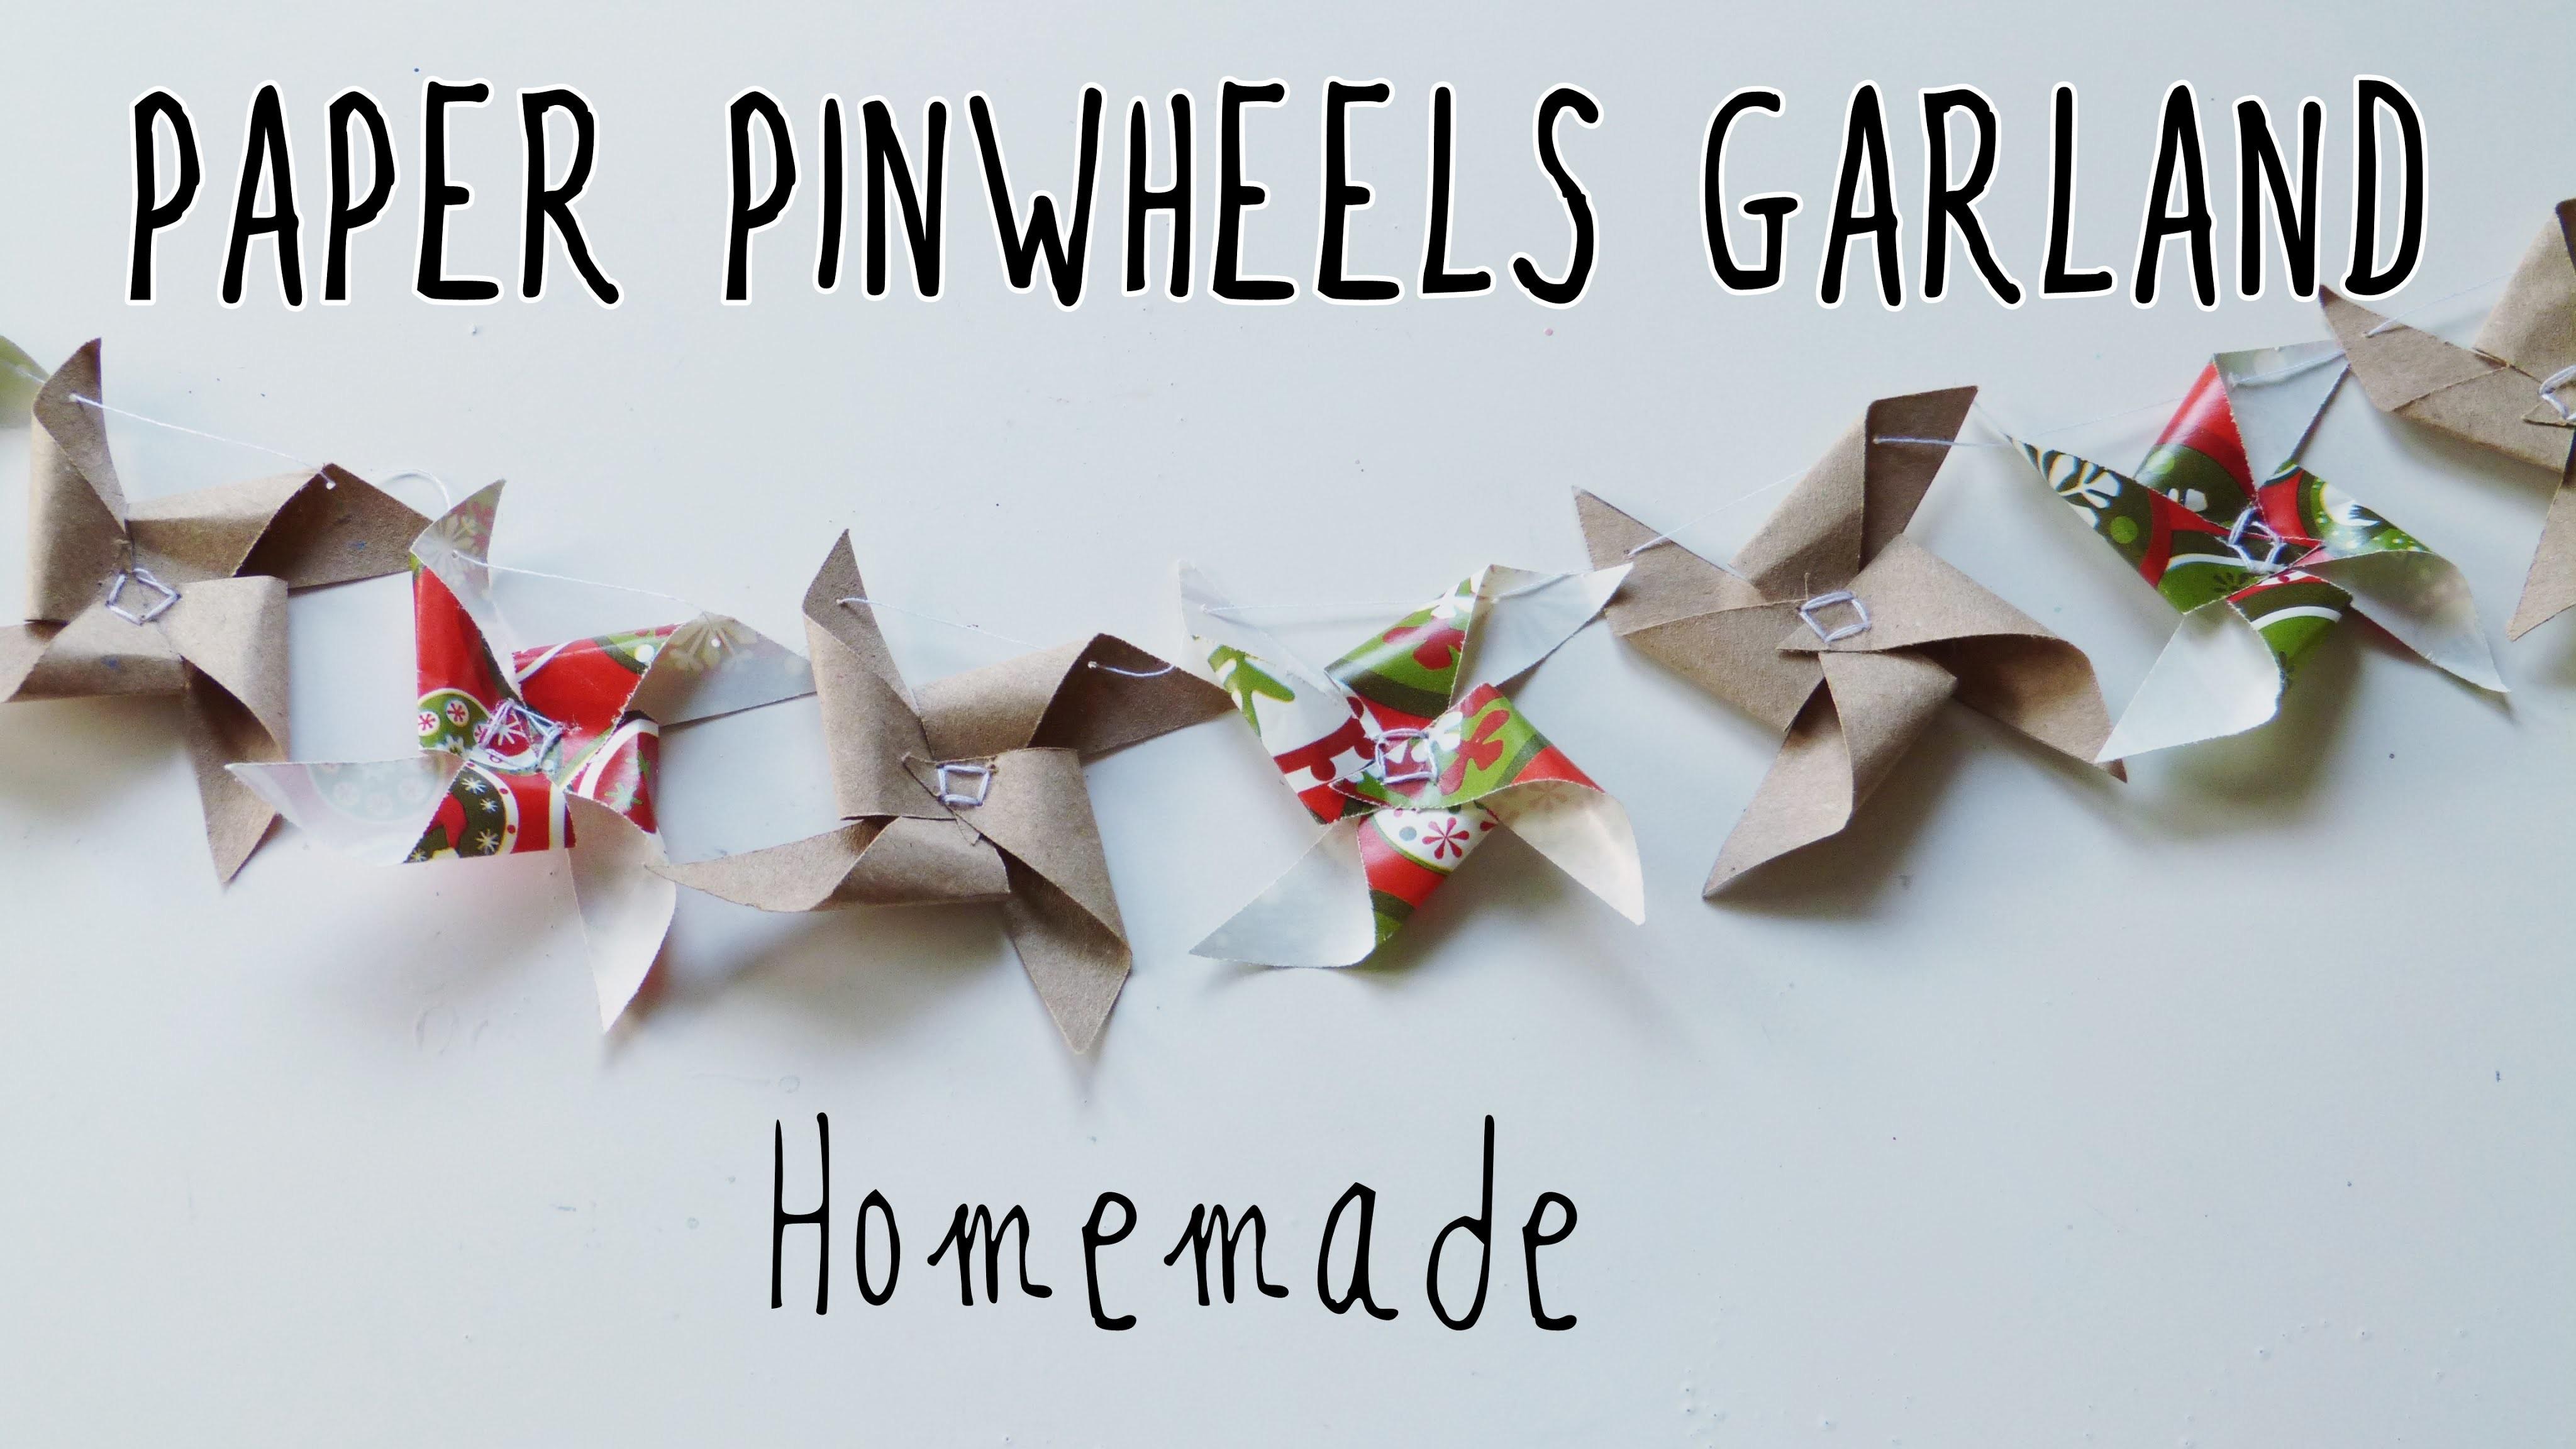 Paper pinwheels garland (easy crafts to make at home)